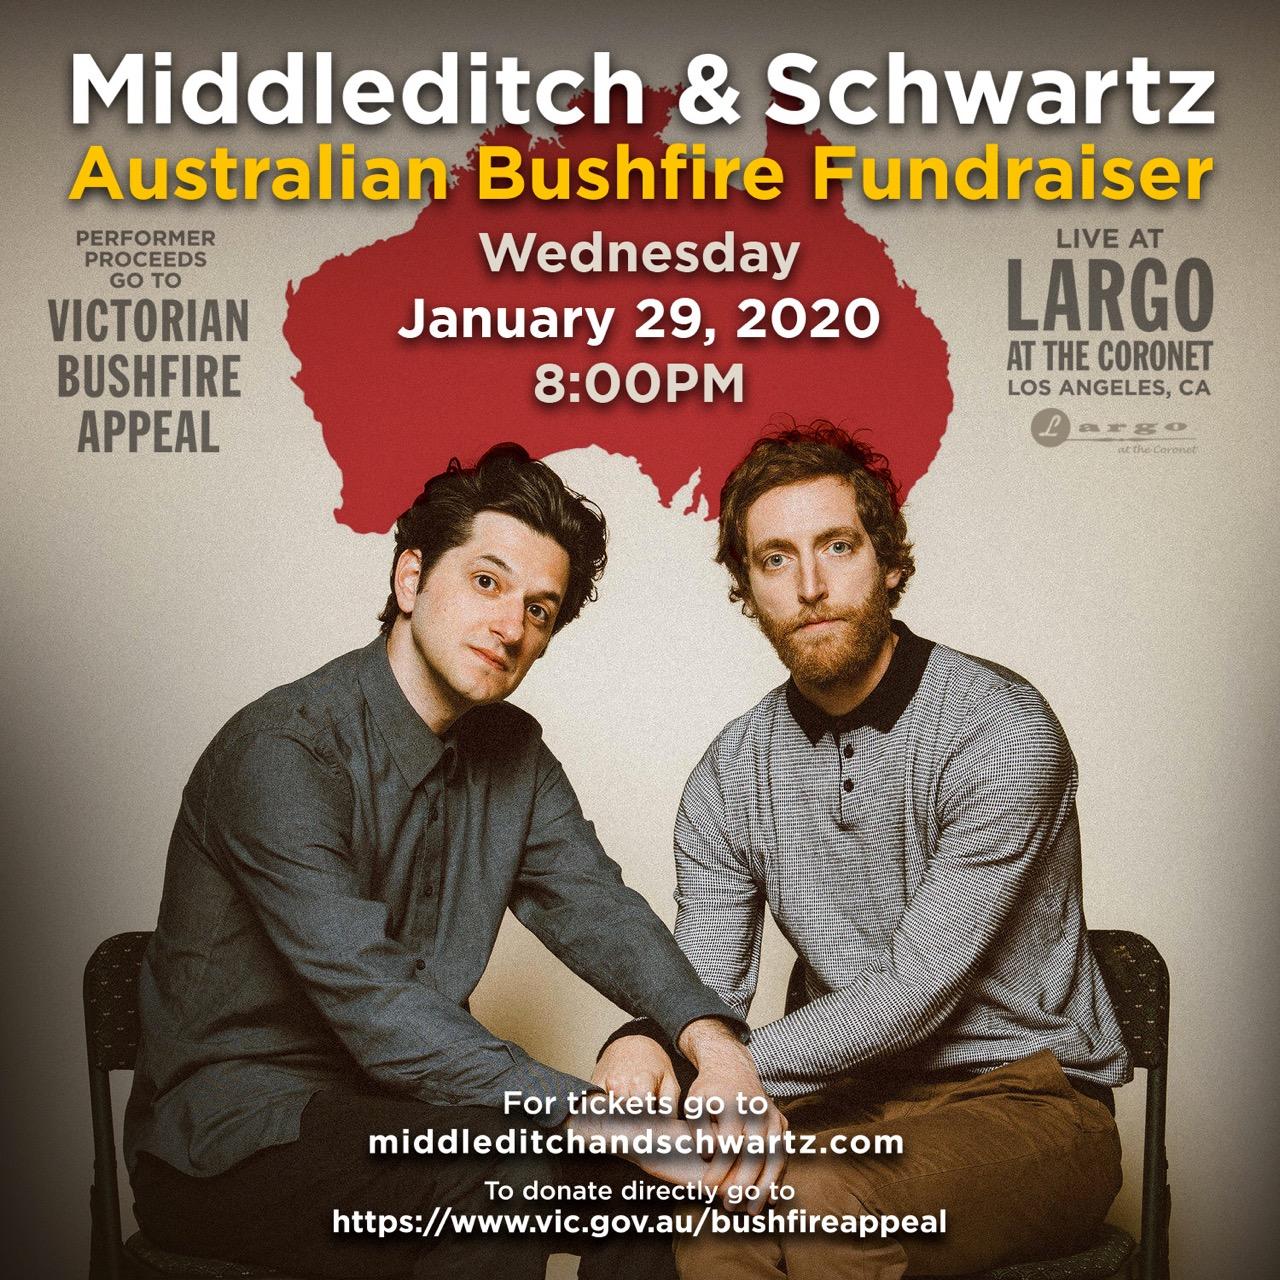 Middleditch & Schwartz - Australian Bushfire Fundraiser